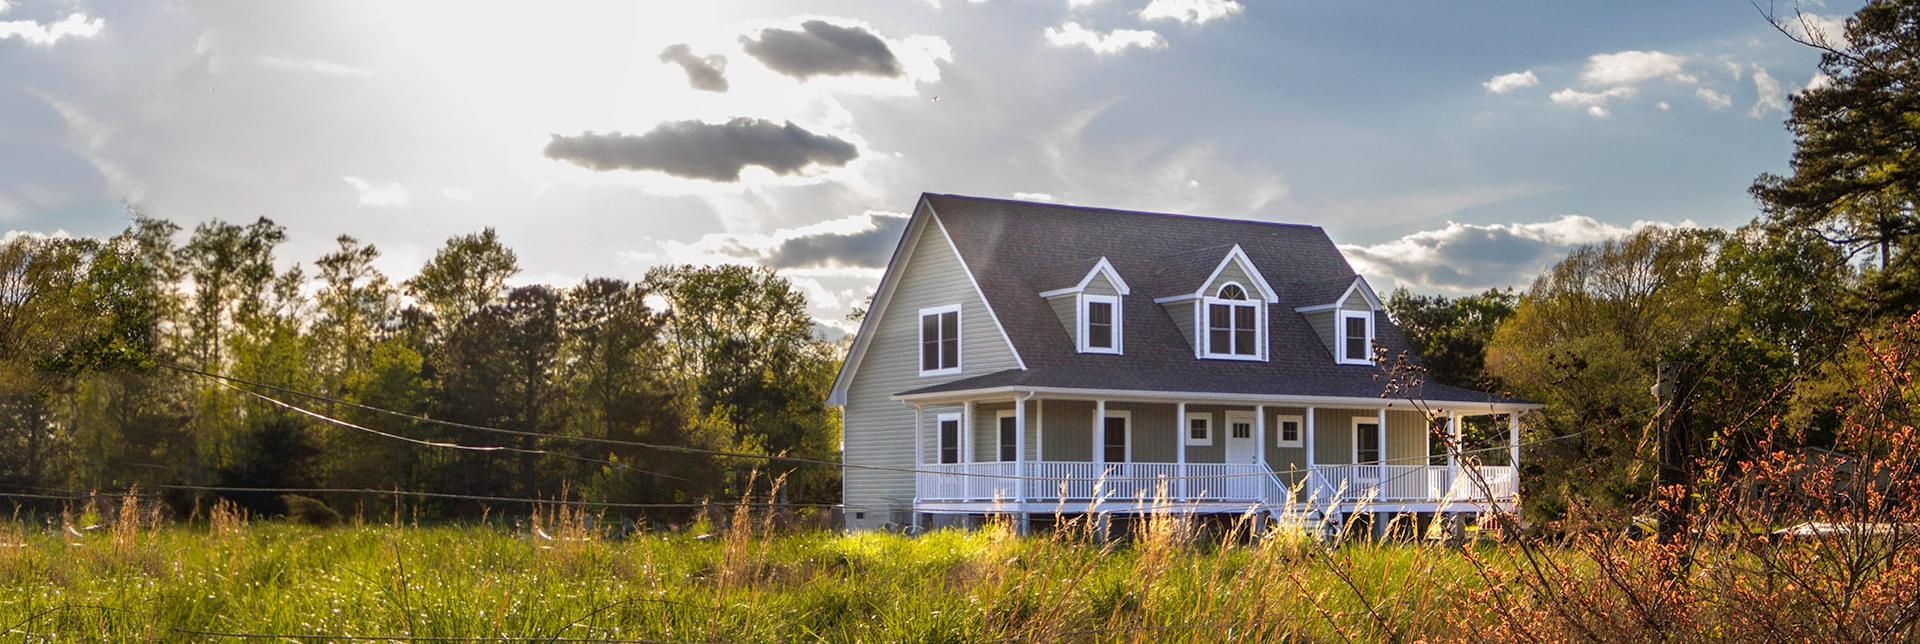 New Homes in Williamsburg VA